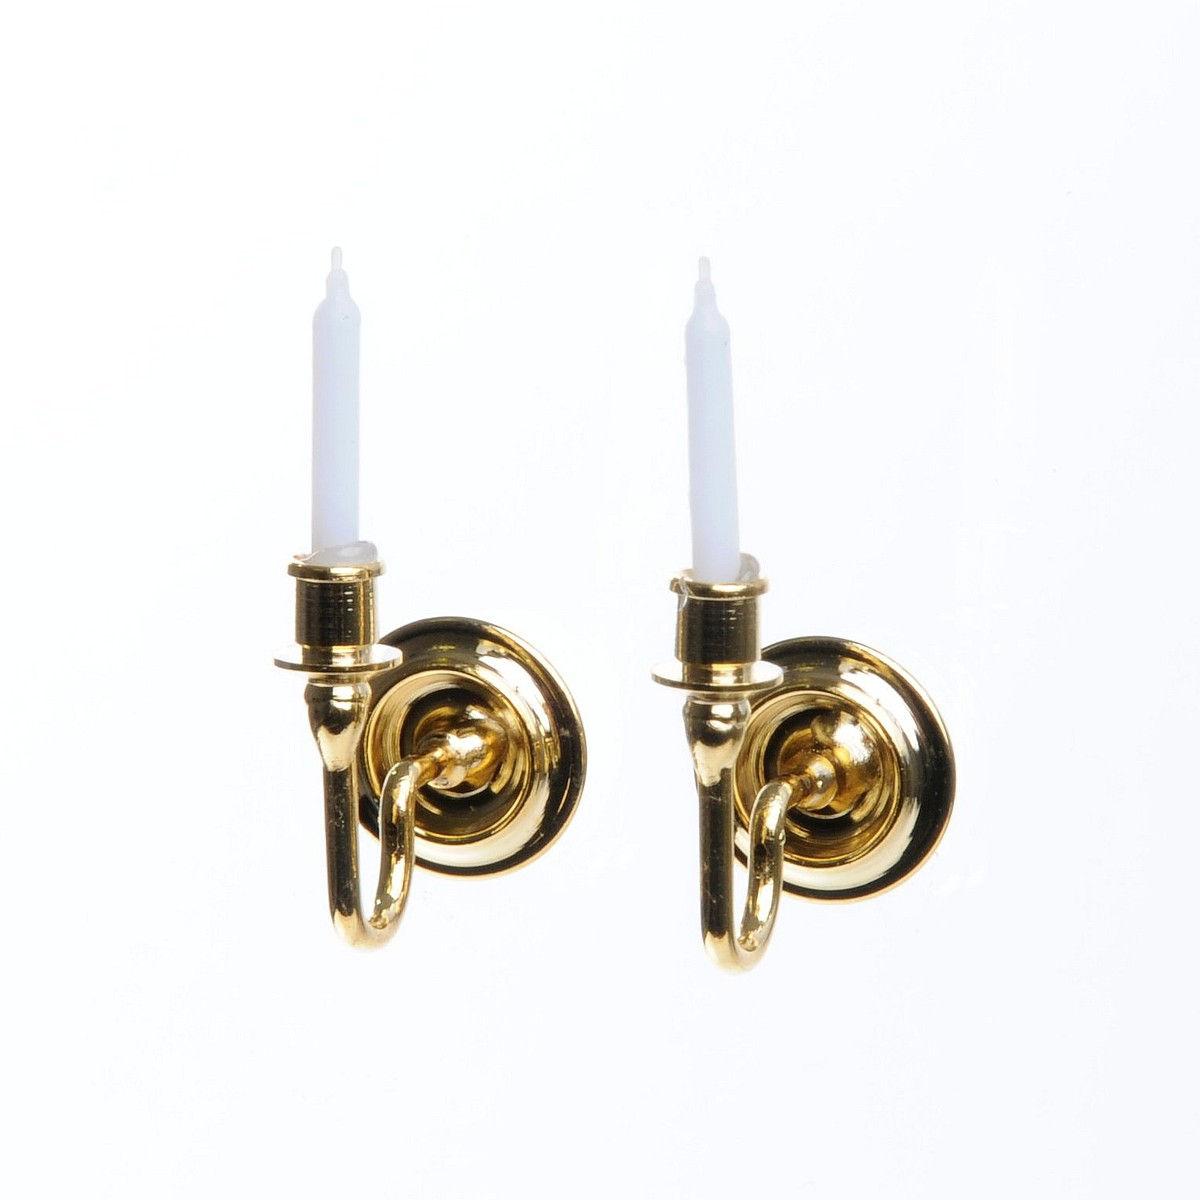 kerzen wandhalter messing vergoldet 17220. Black Bedroom Furniture Sets. Home Design Ideas